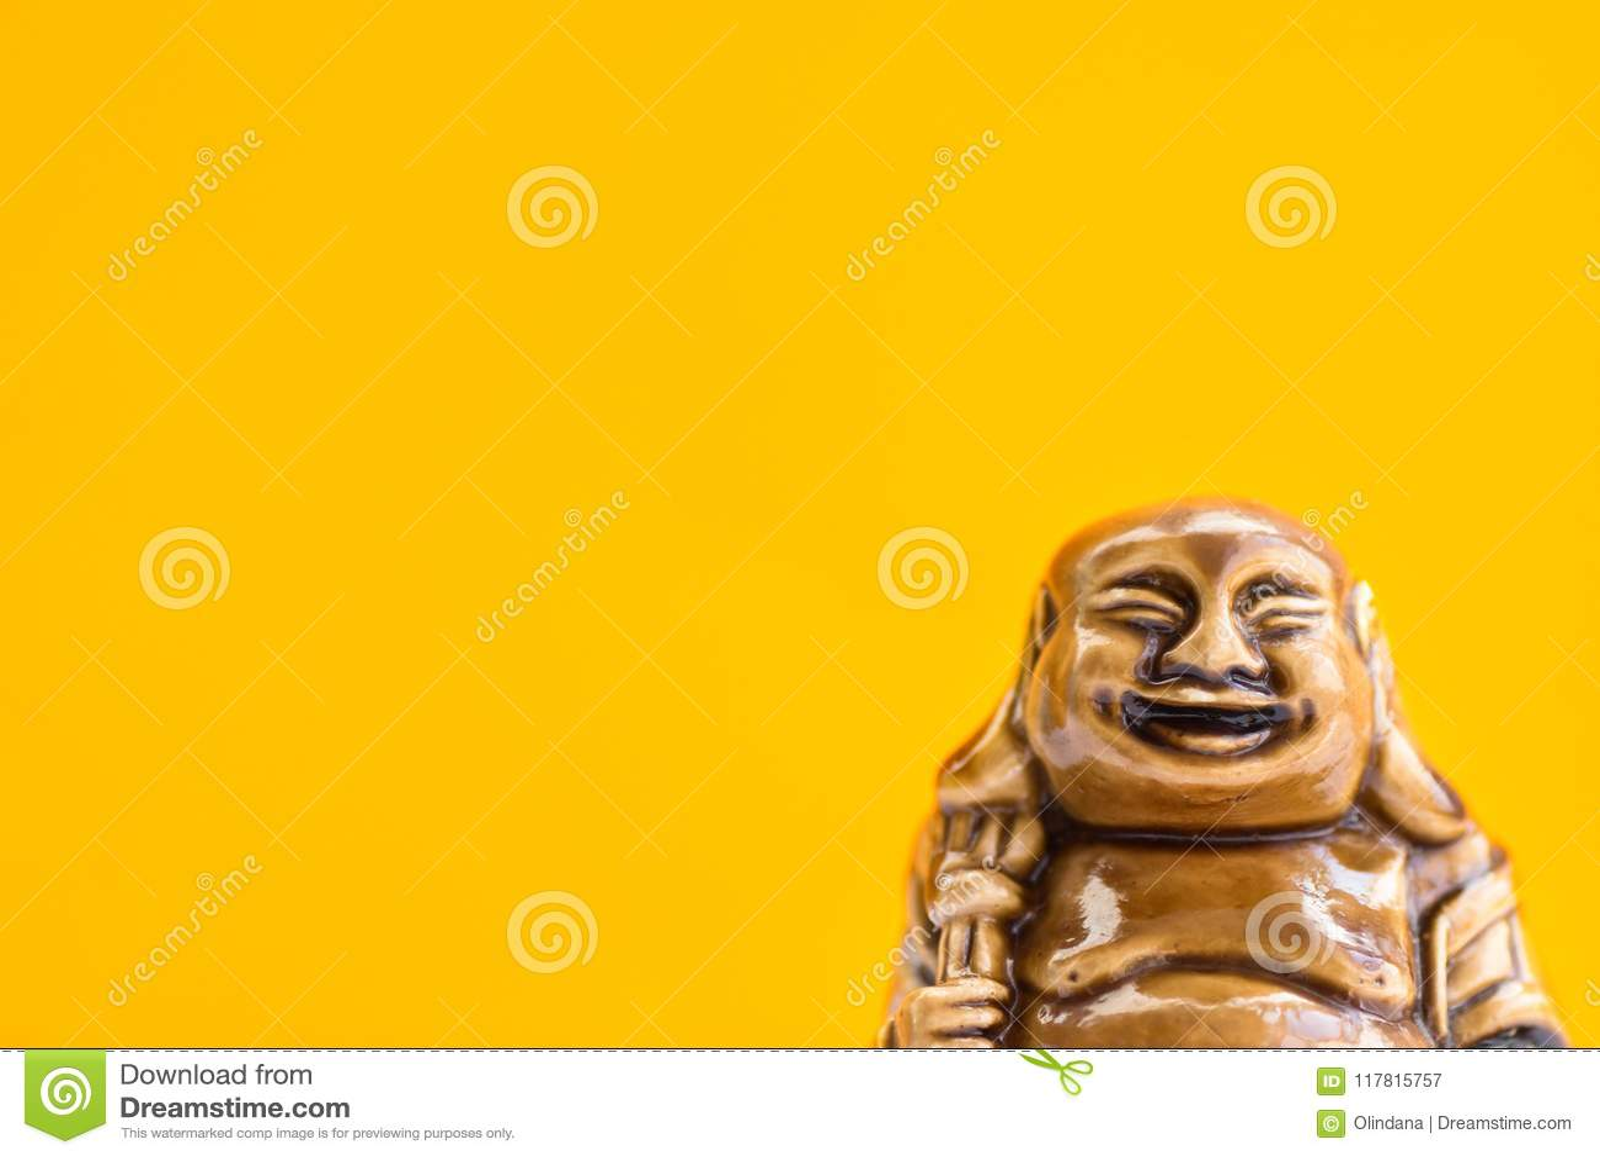 Ceramic Statue Of Laughing Buddha On Bright Orange Background